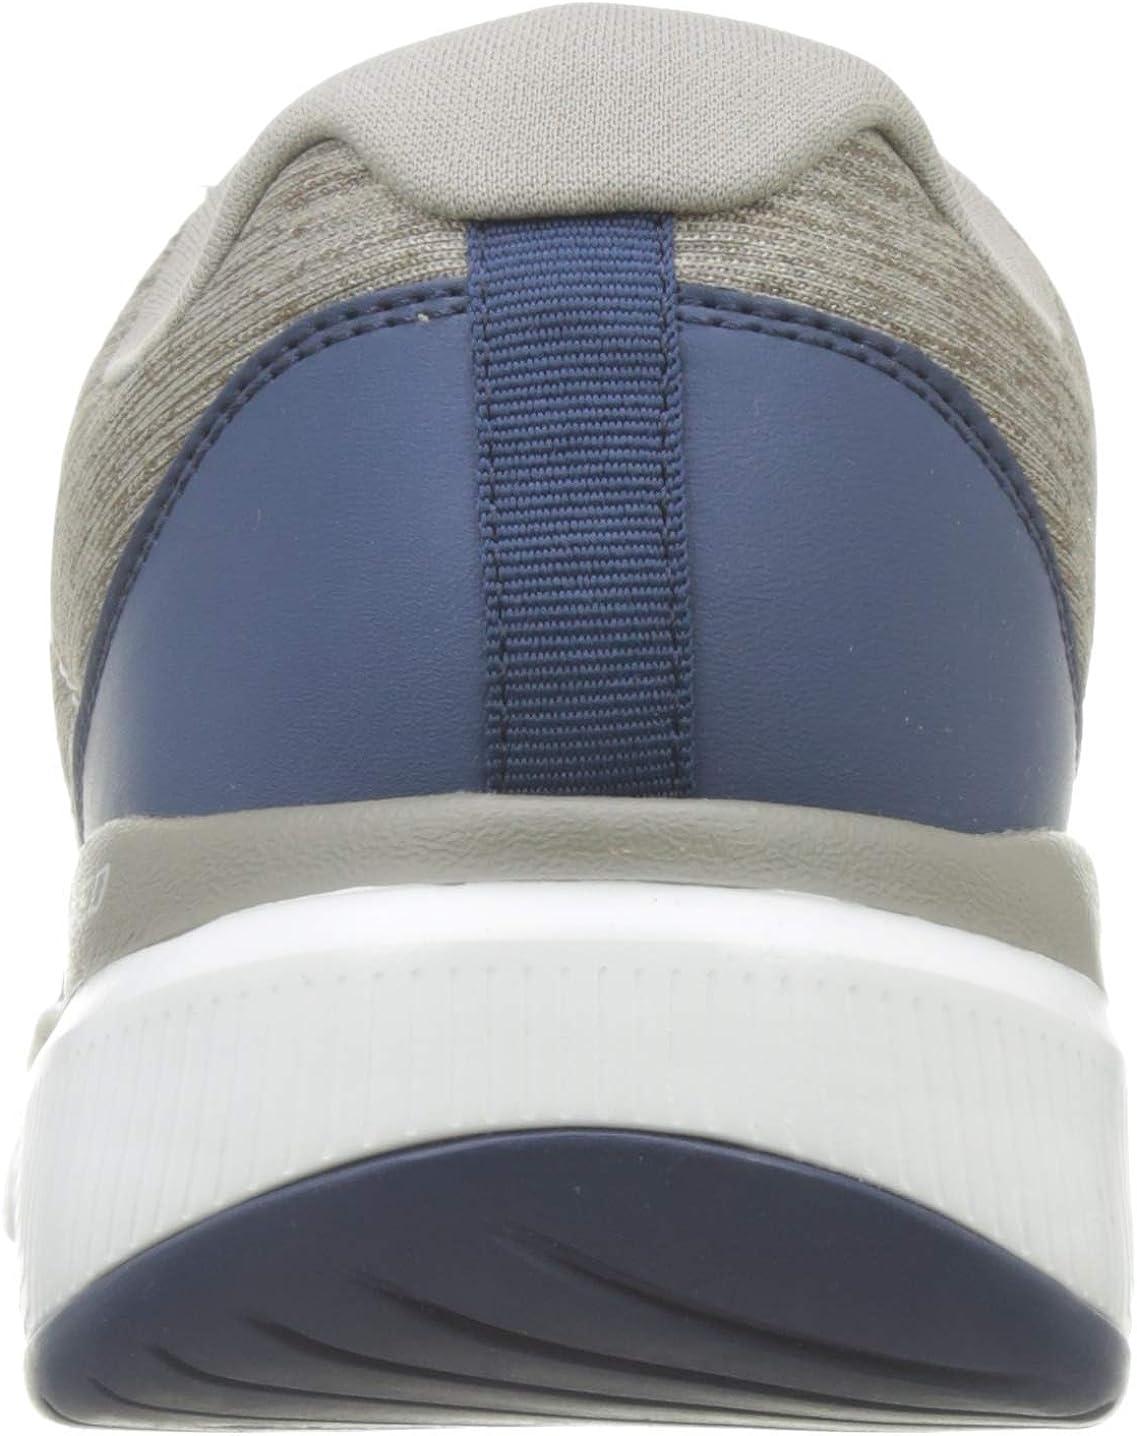 Skechers Men's Flex Advantage 3.0 Stally Oxford Beige Taupe Blue Tpbl